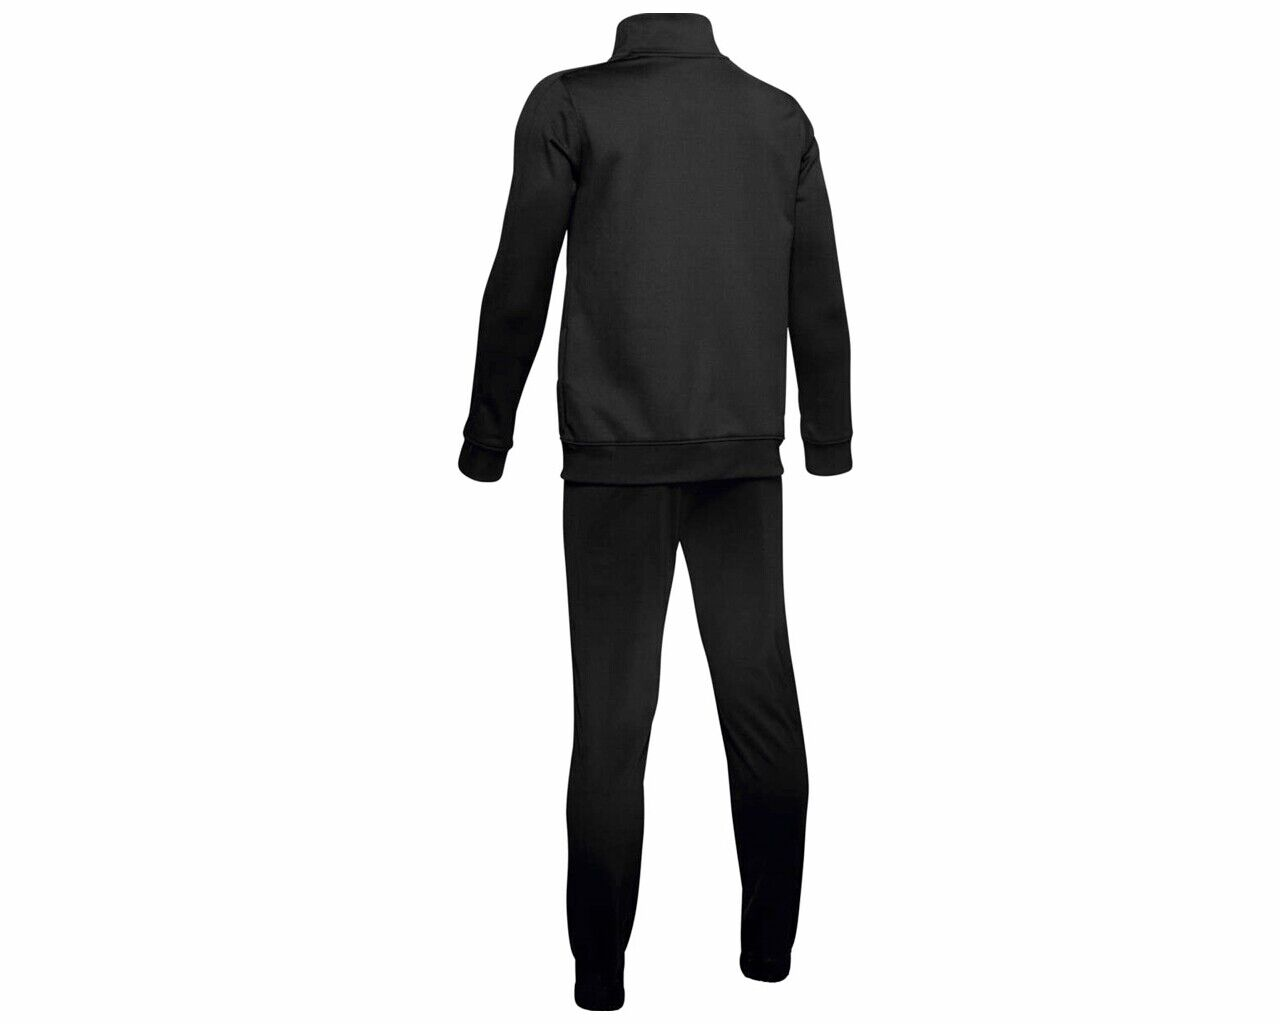 Under Armour Juniors 1347743 Full Zip Boys Tracksuit Black Jogsuit